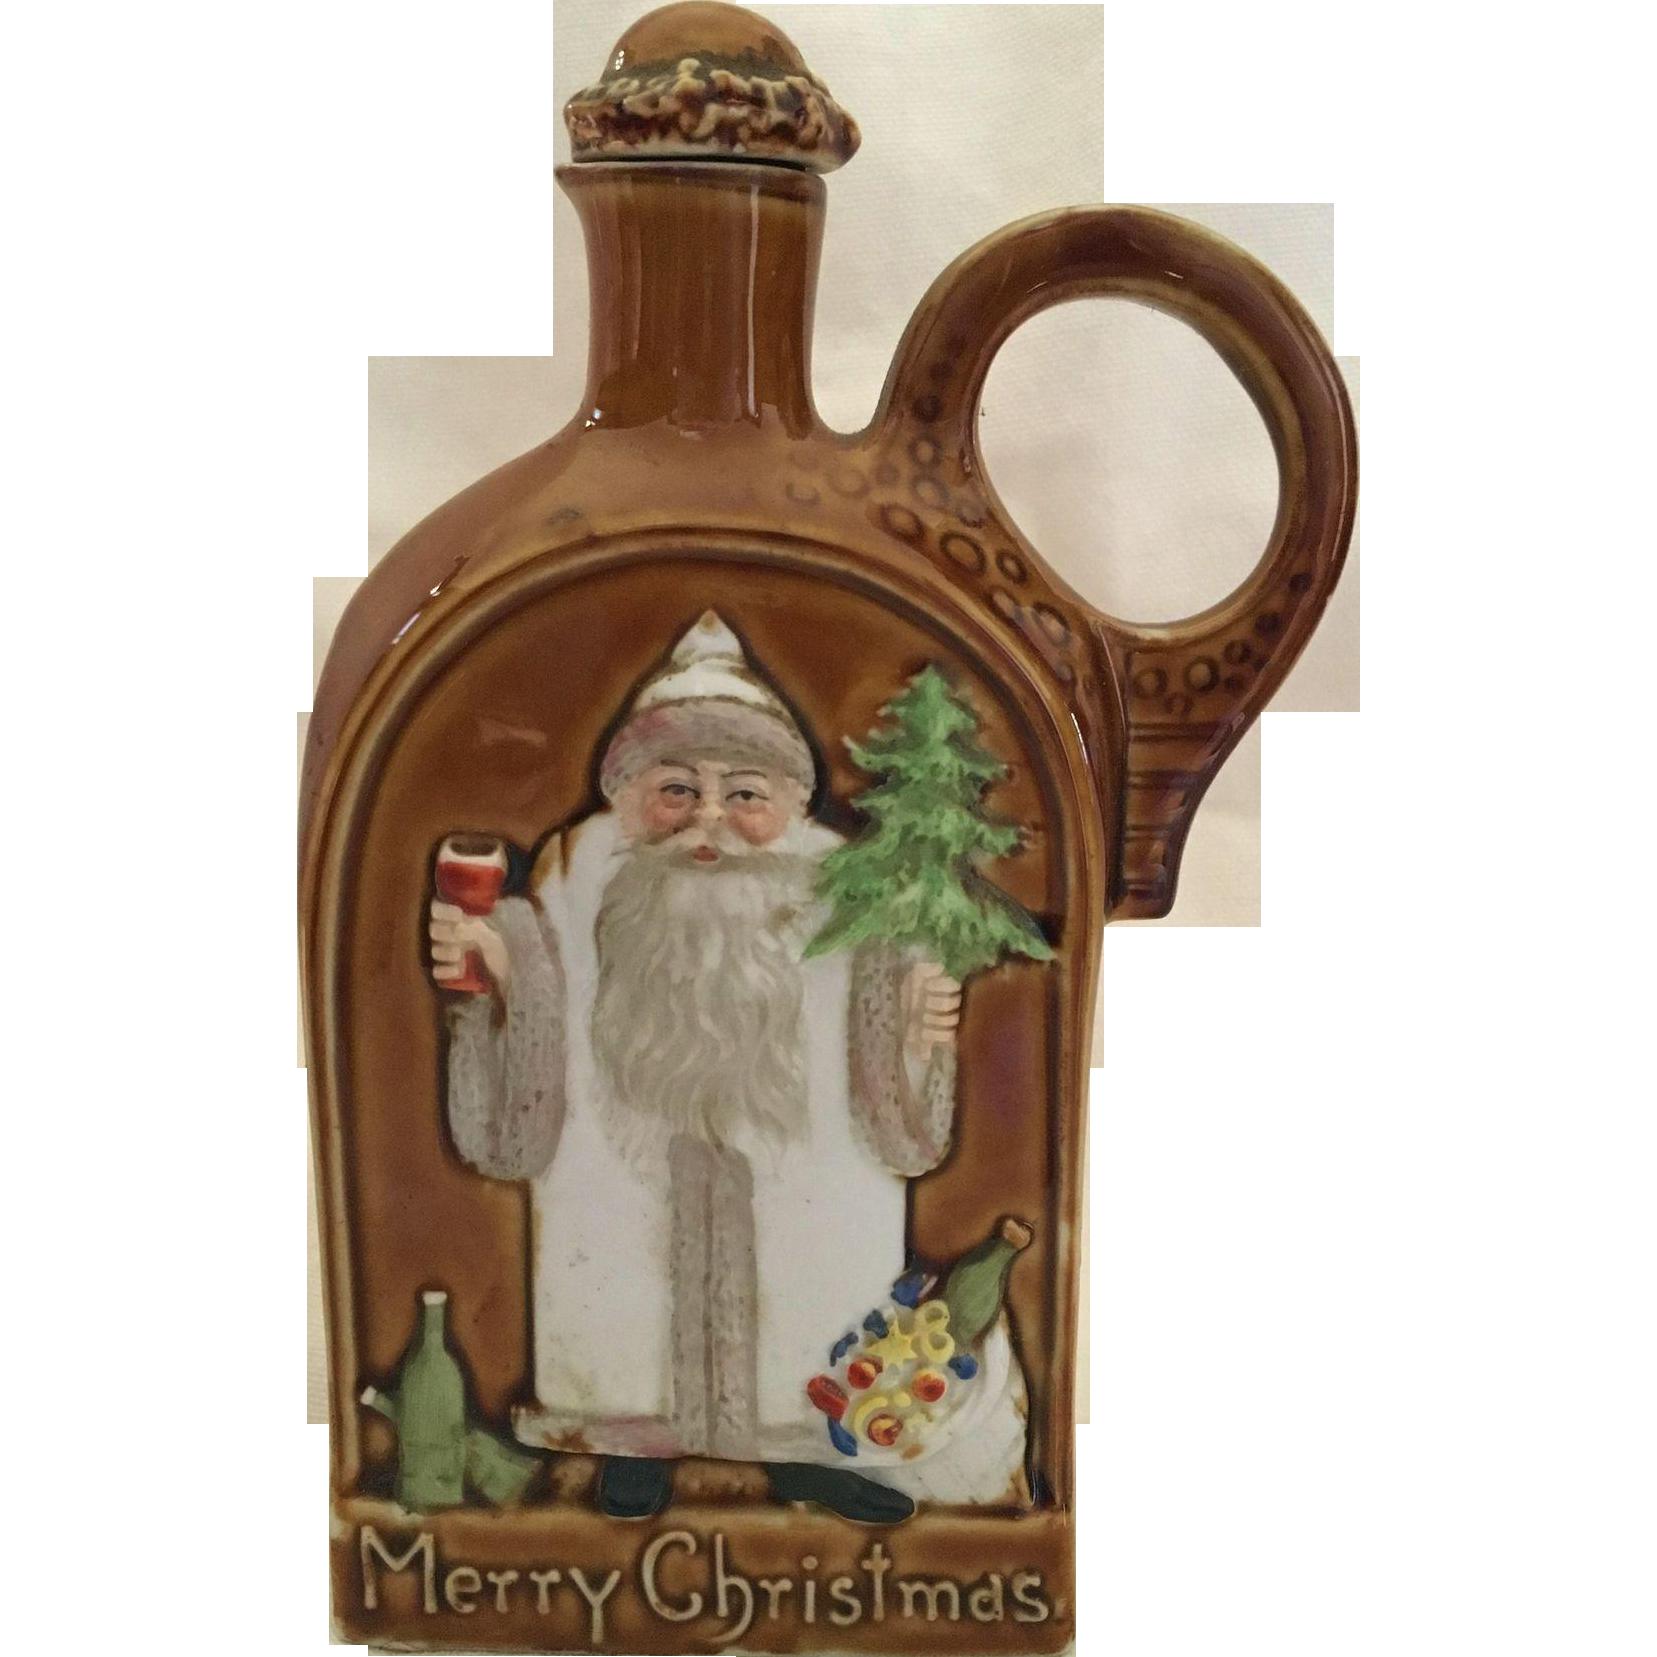 Schafer & Vater Santa Claus Merry Christmas Flask